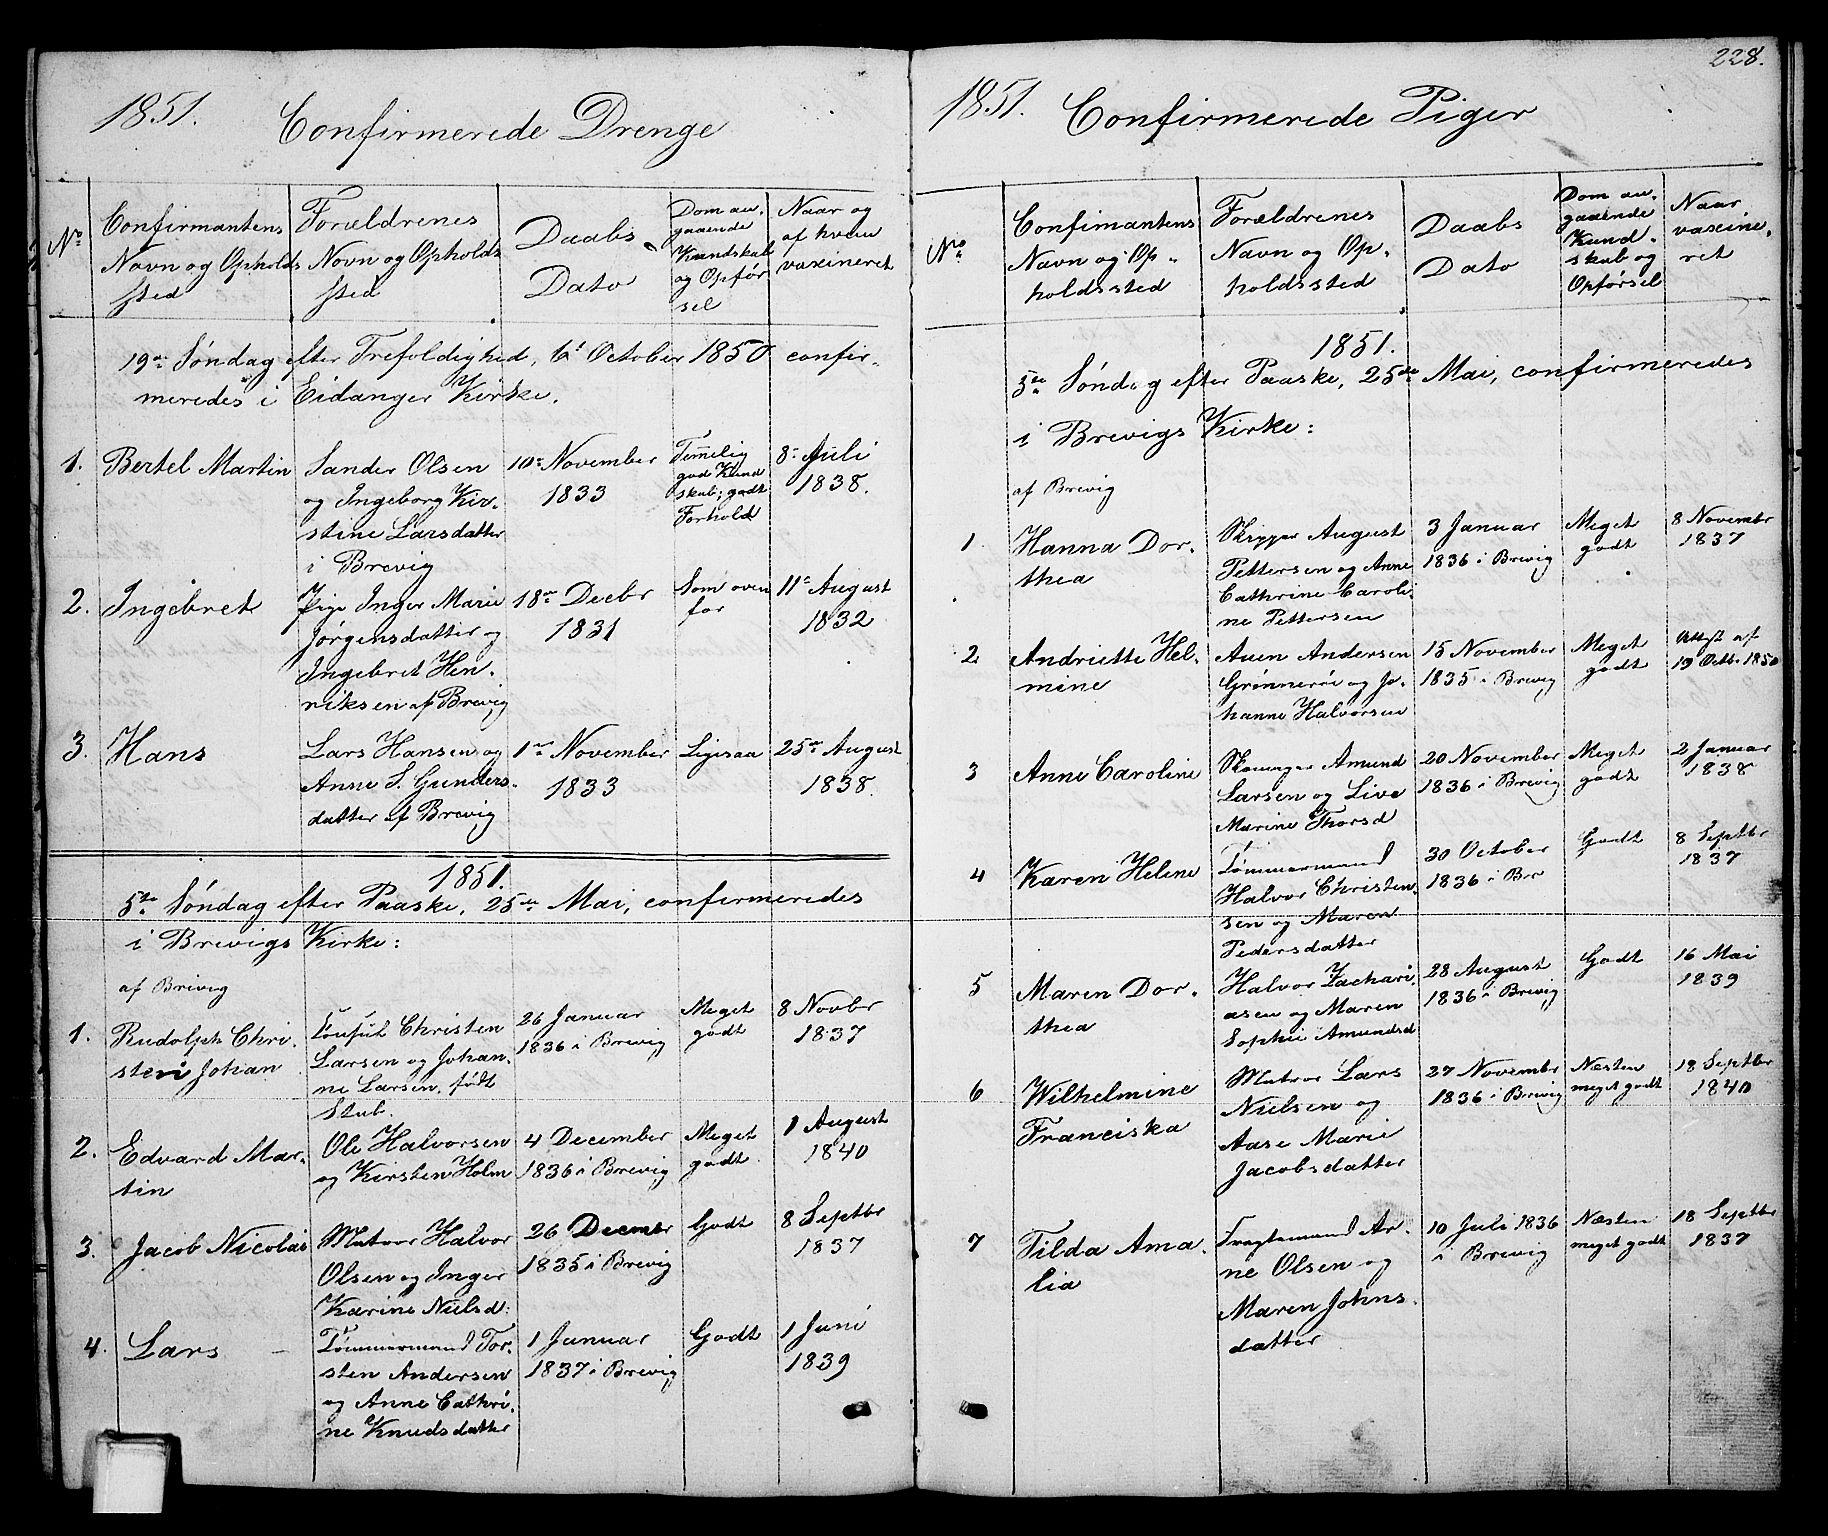 SAKO, Brevik kirkebøker, G/Ga/L0002: Klokkerbok nr. 2, 1846-1865, s. 228